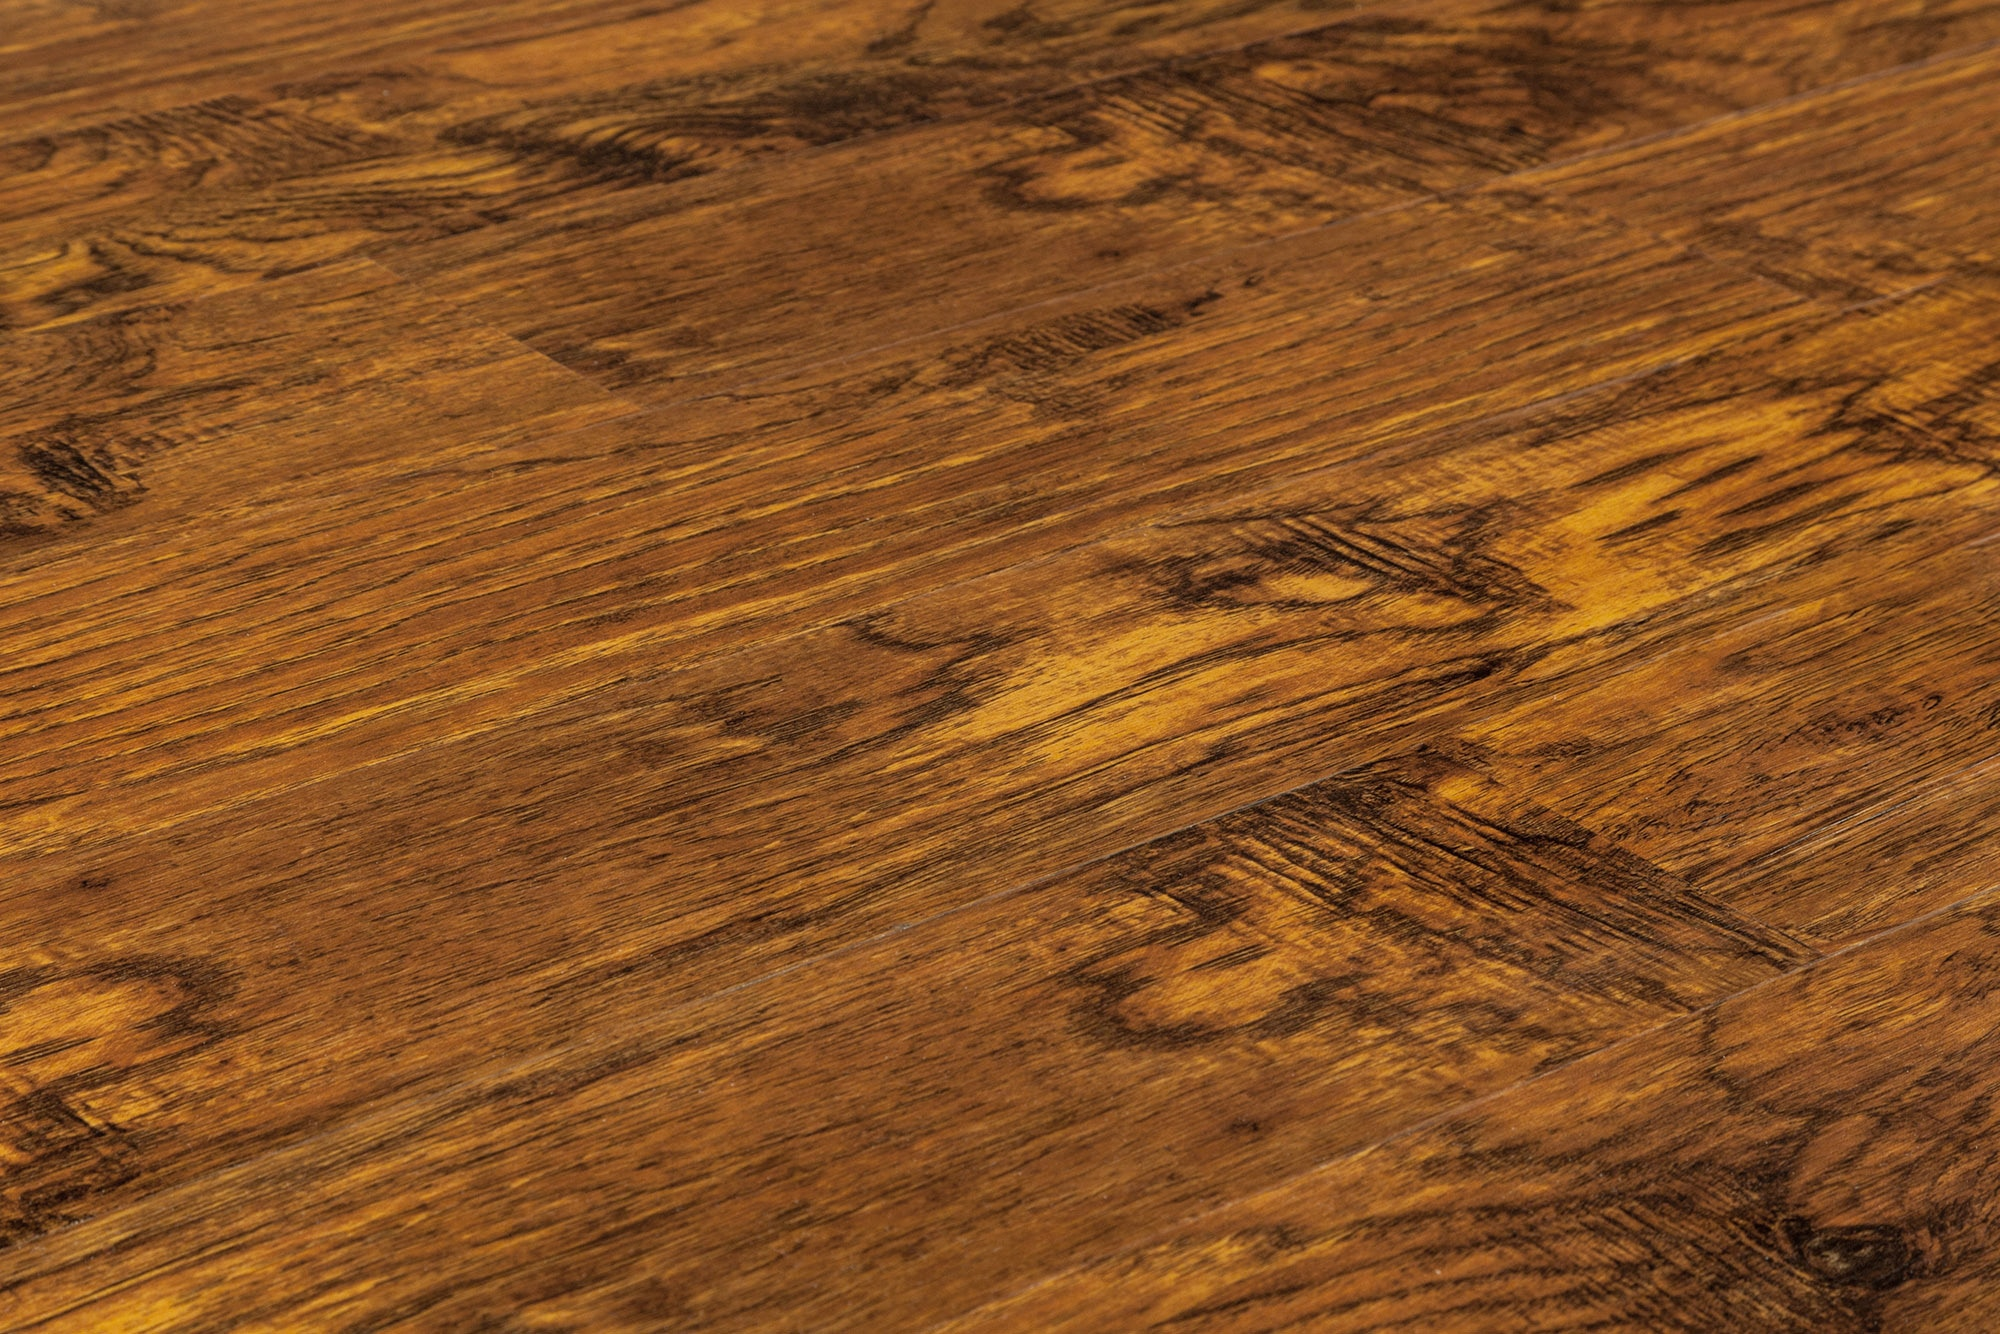 Vinyl Flooring FREE Samples Available At BuildDirect - Best tool for cutting vinyl plank flooring